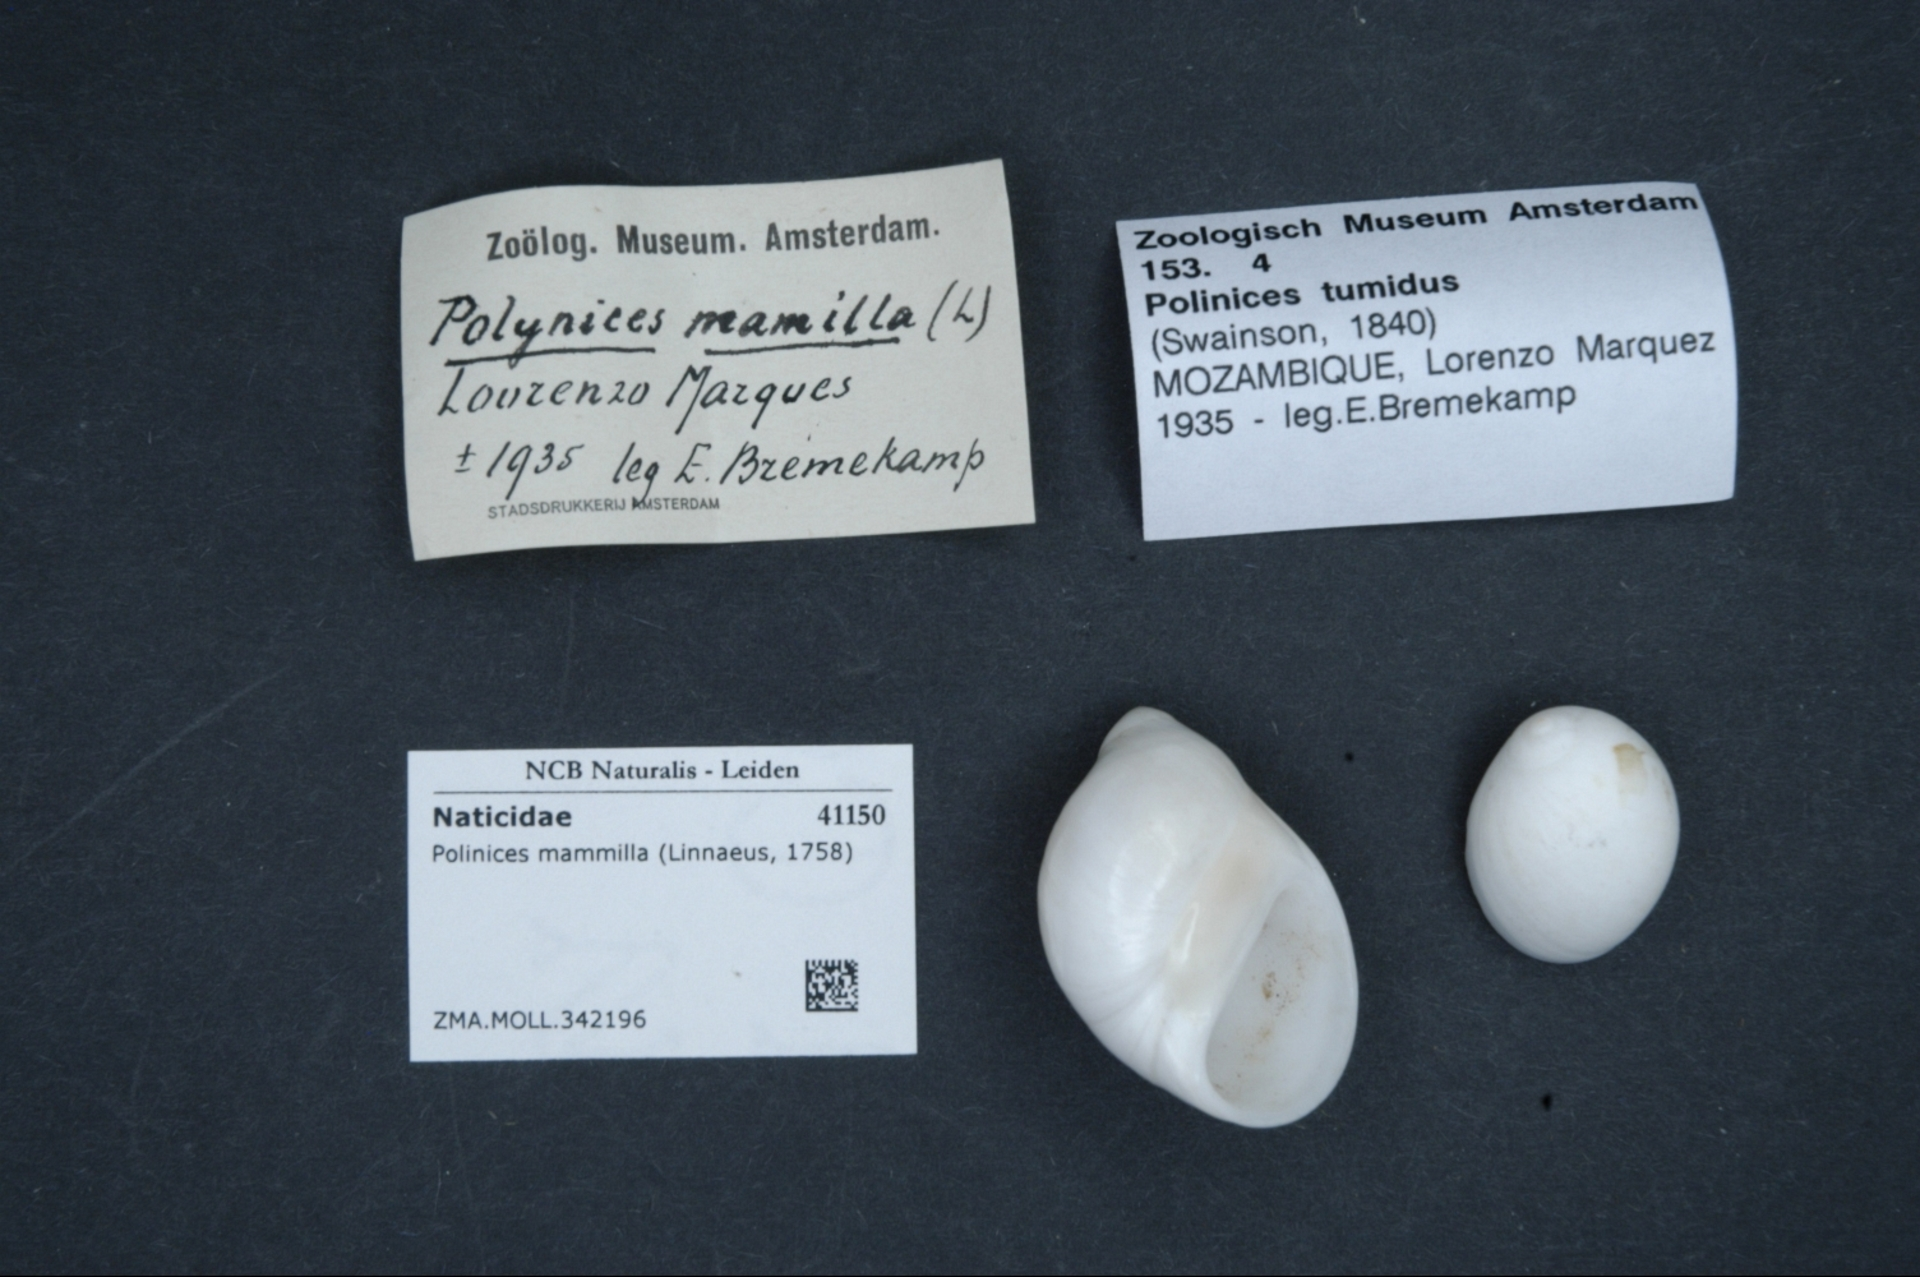 ZMA.MOLL.342196 | Polinices mammilla (Linnaeus, 1758)